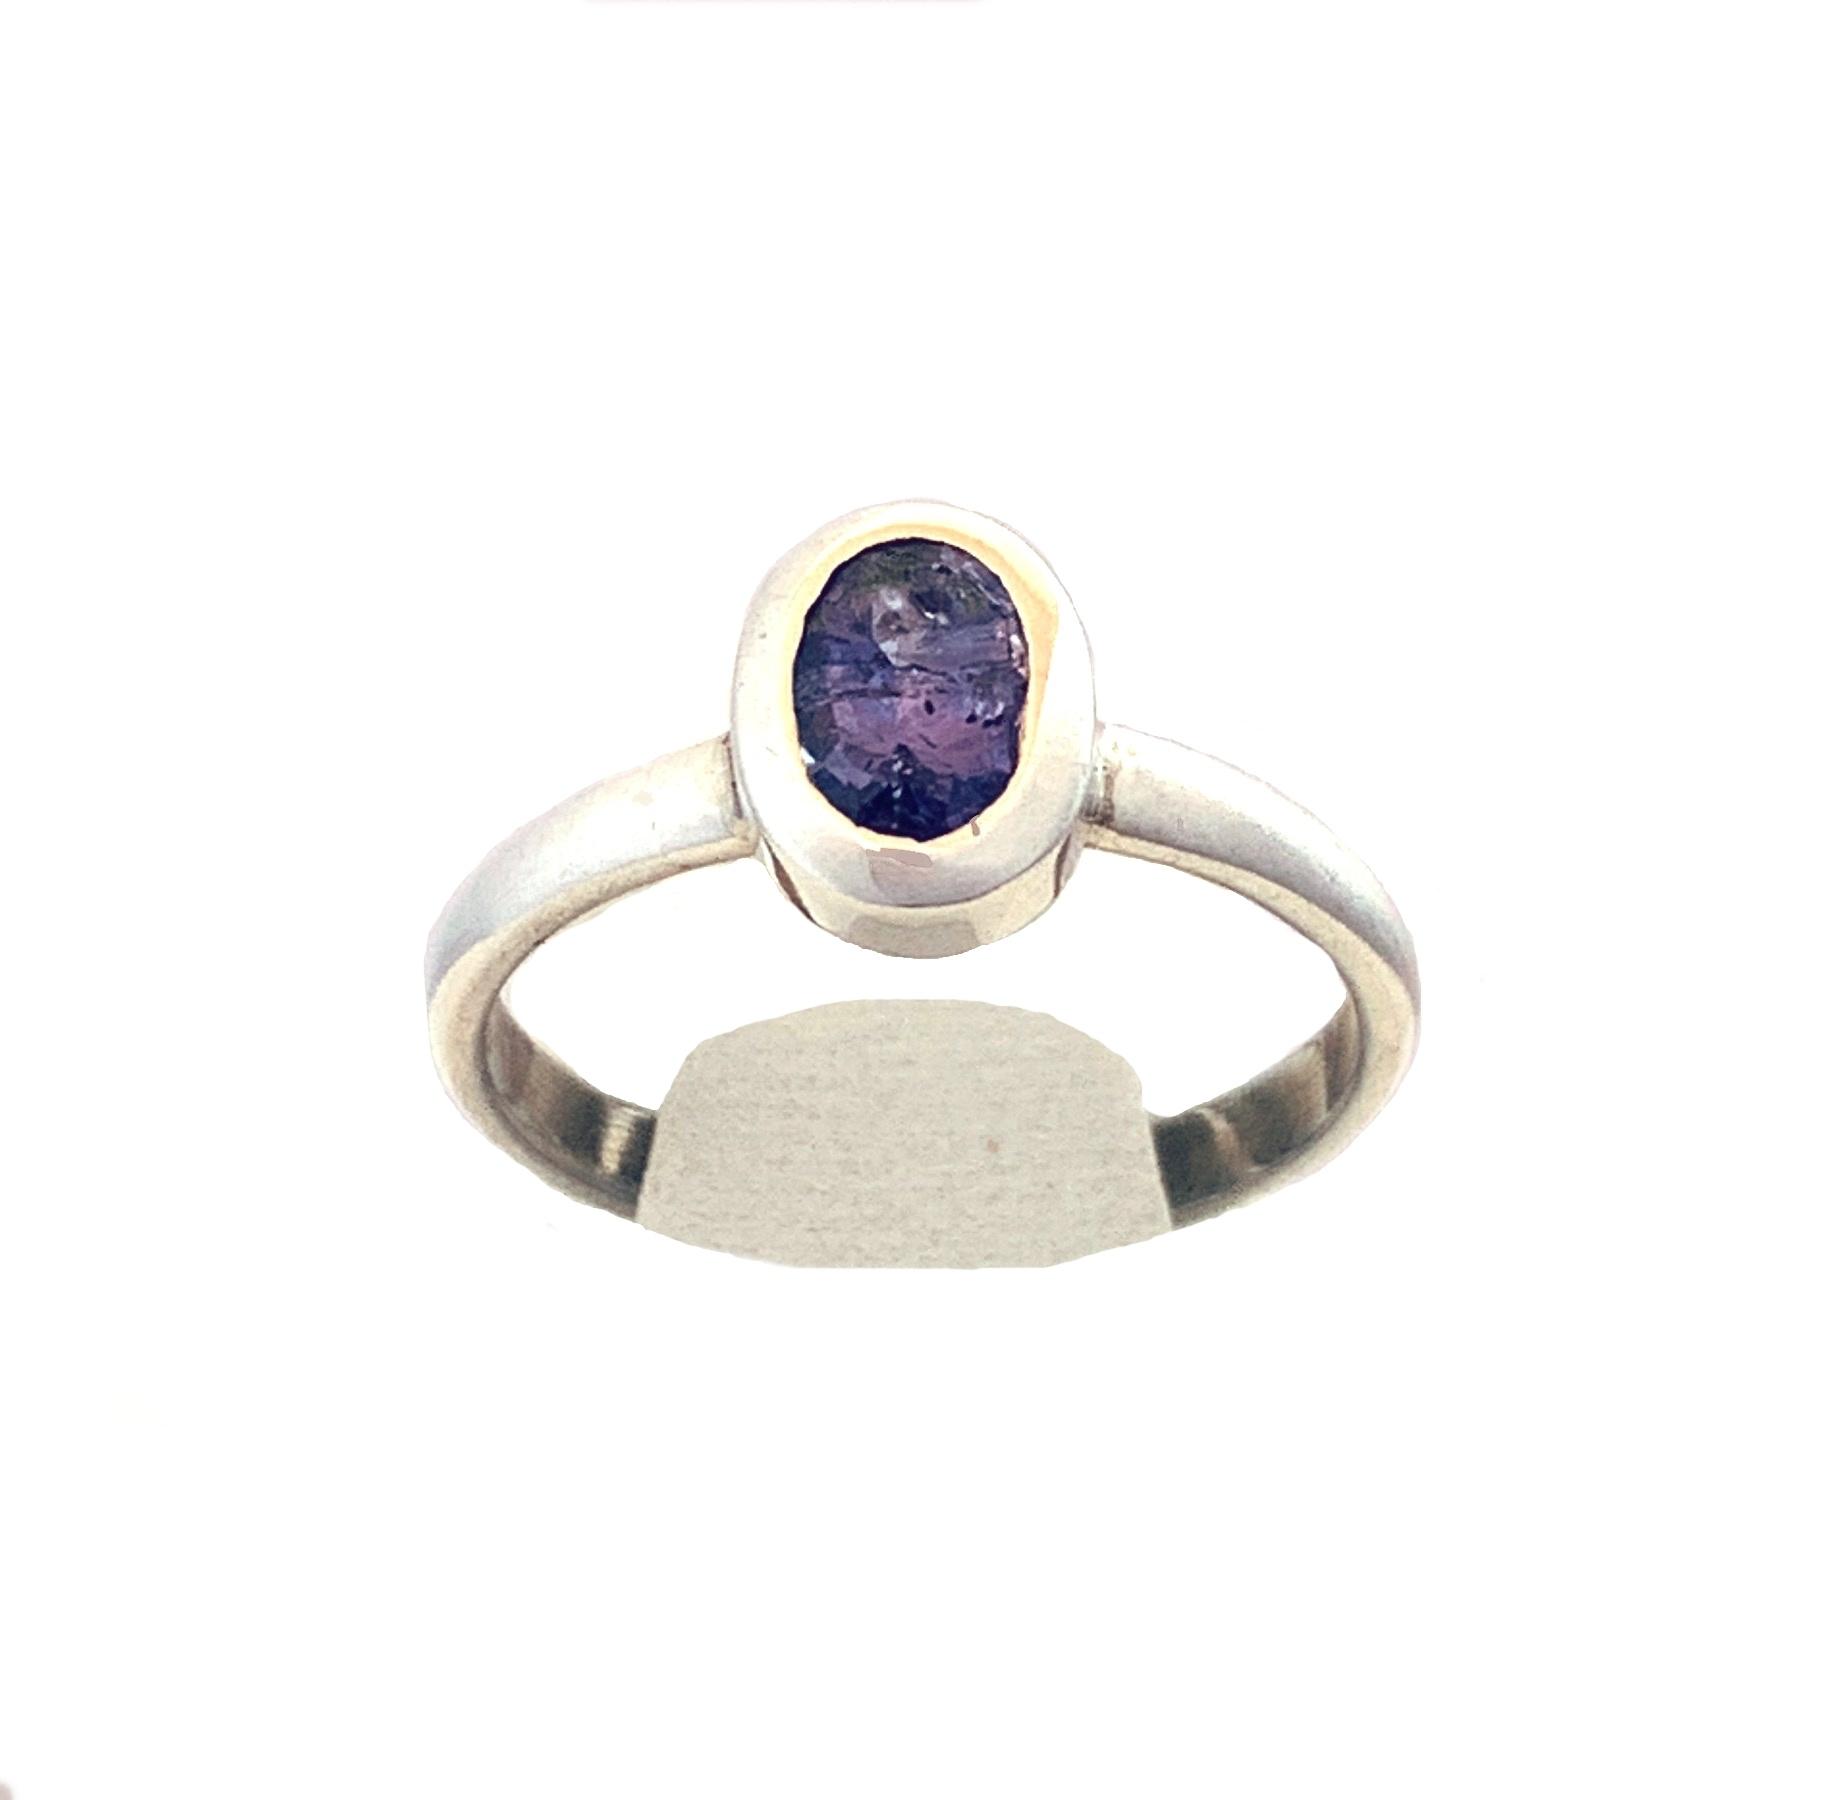 Kiliaan Jewelry Collectie Tanzaniet ring